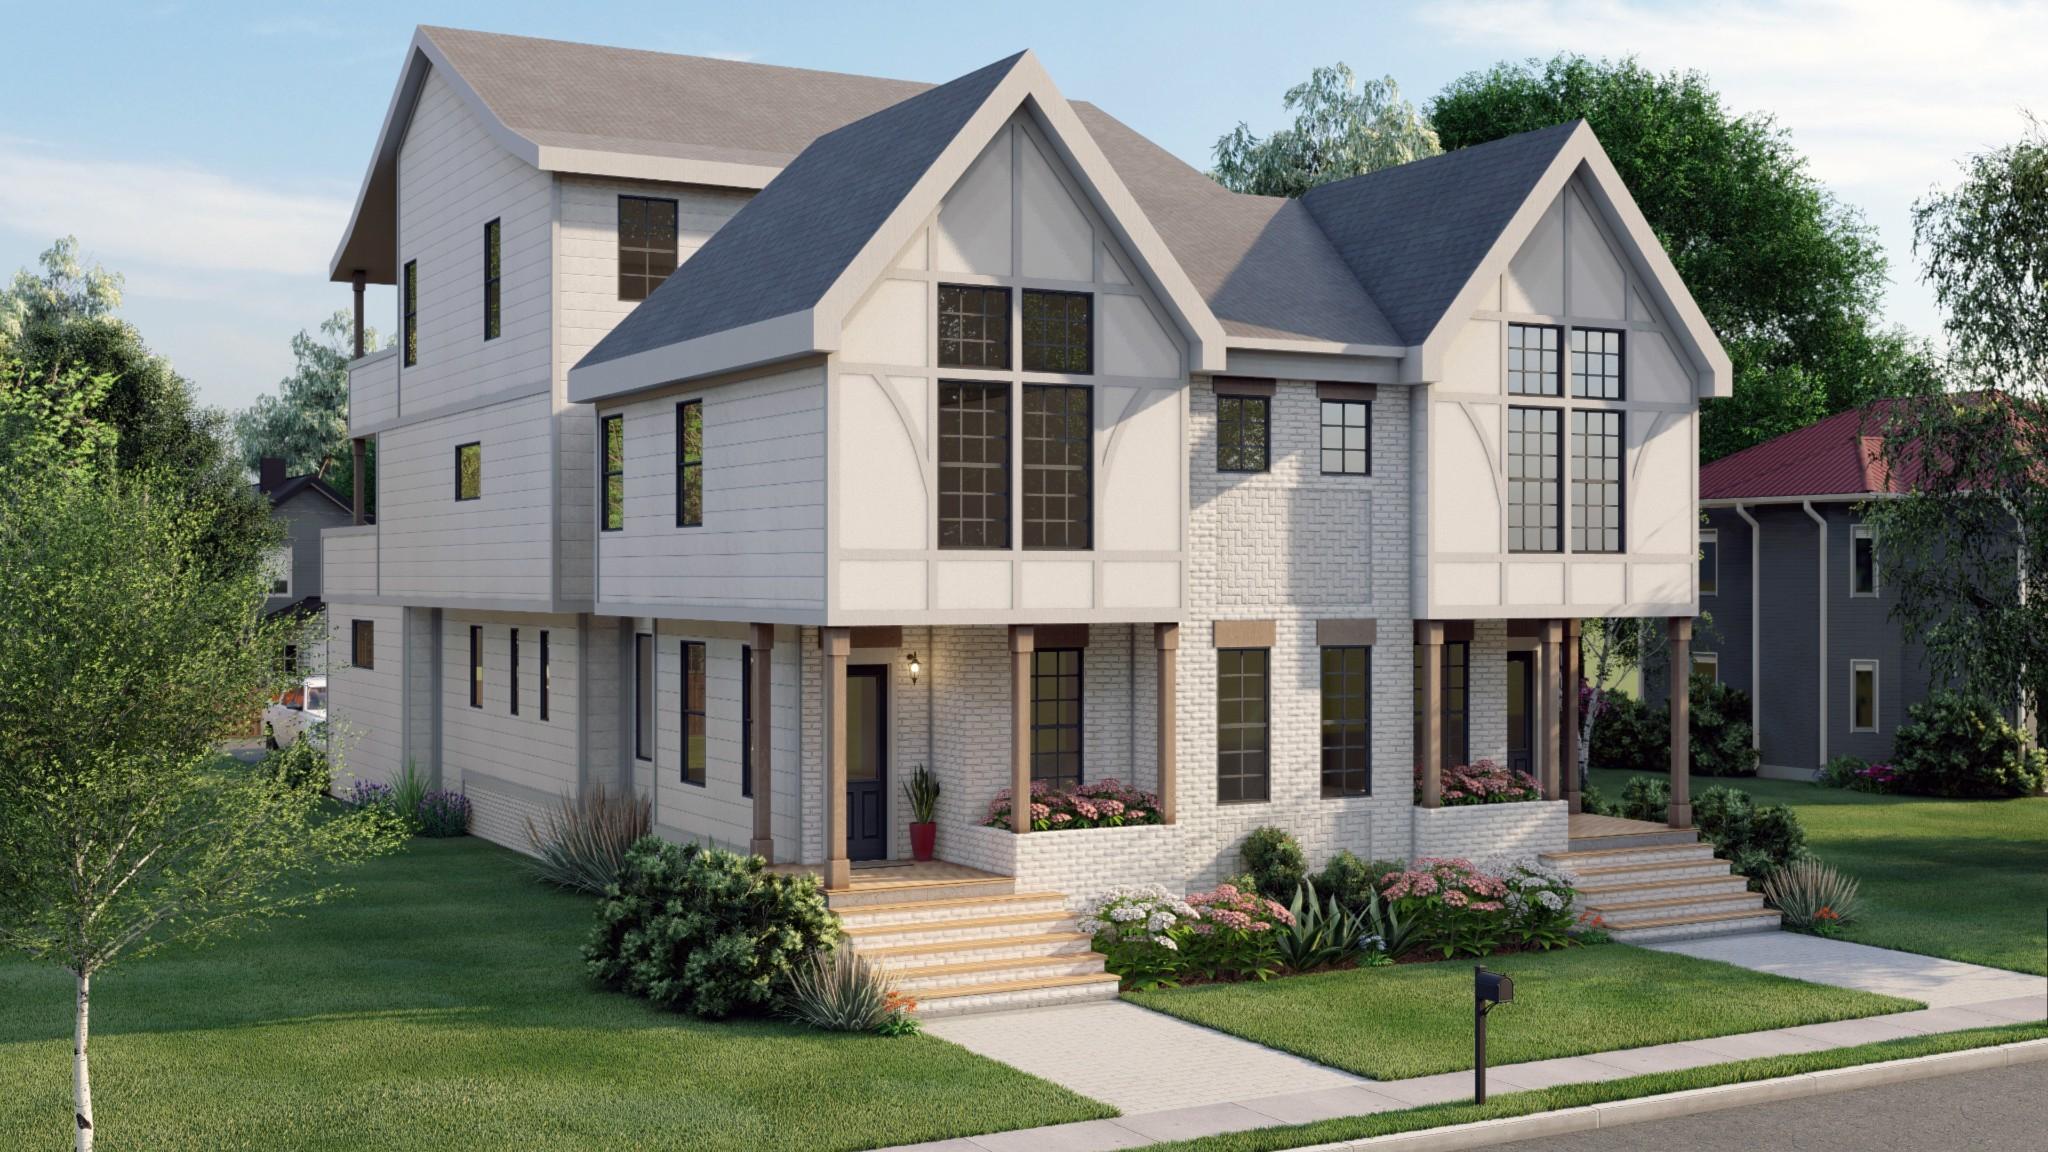 1006 14Th Ave S, Nashville, TN 37212 - Nashville, TN real estate listing